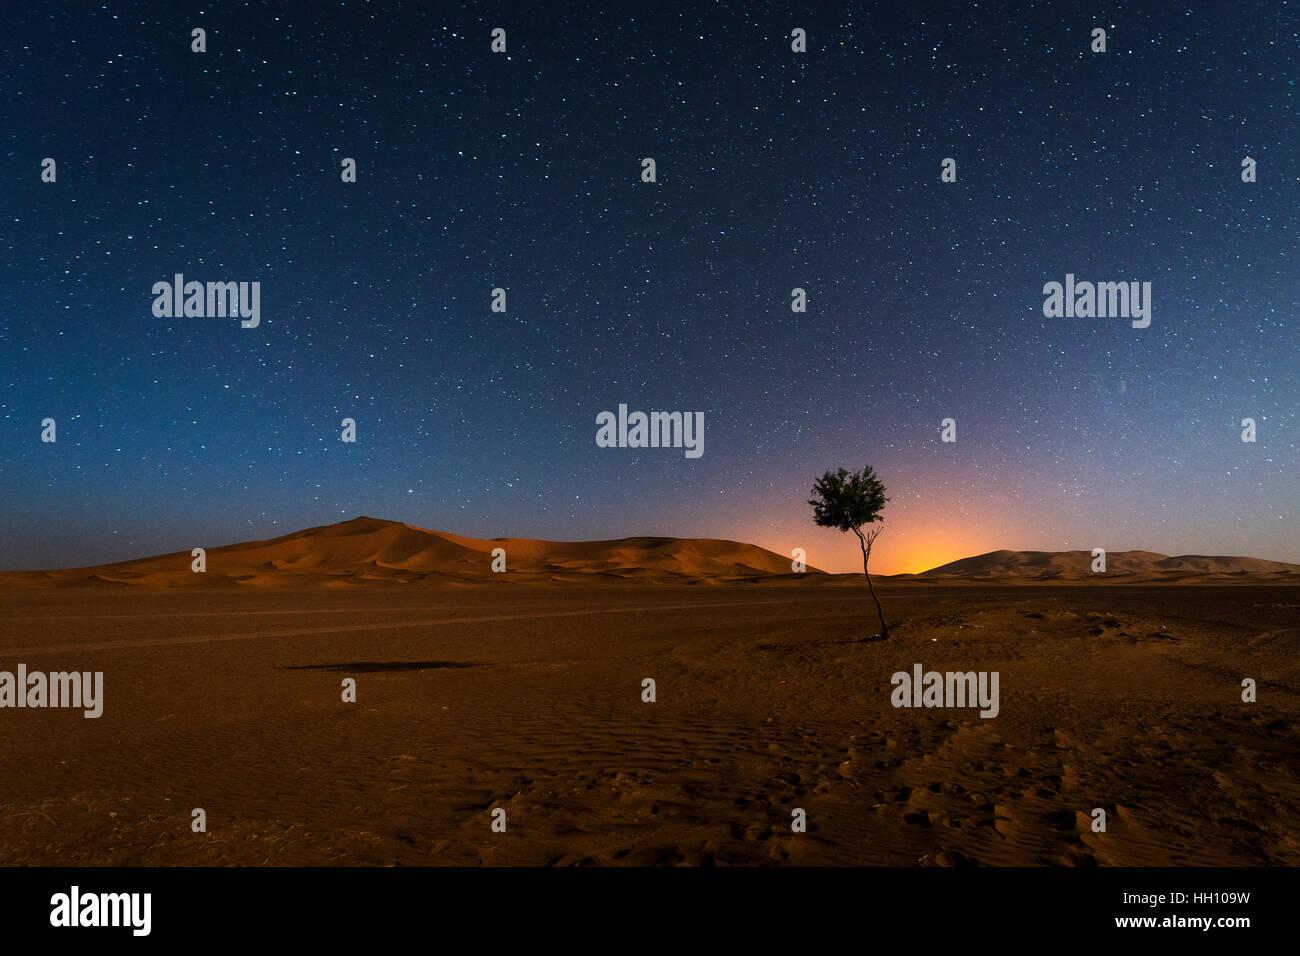 Die Dünen im Erg Chebbi in Marokko bei Nacht Wih den Himmel voller Sterne Stockbild